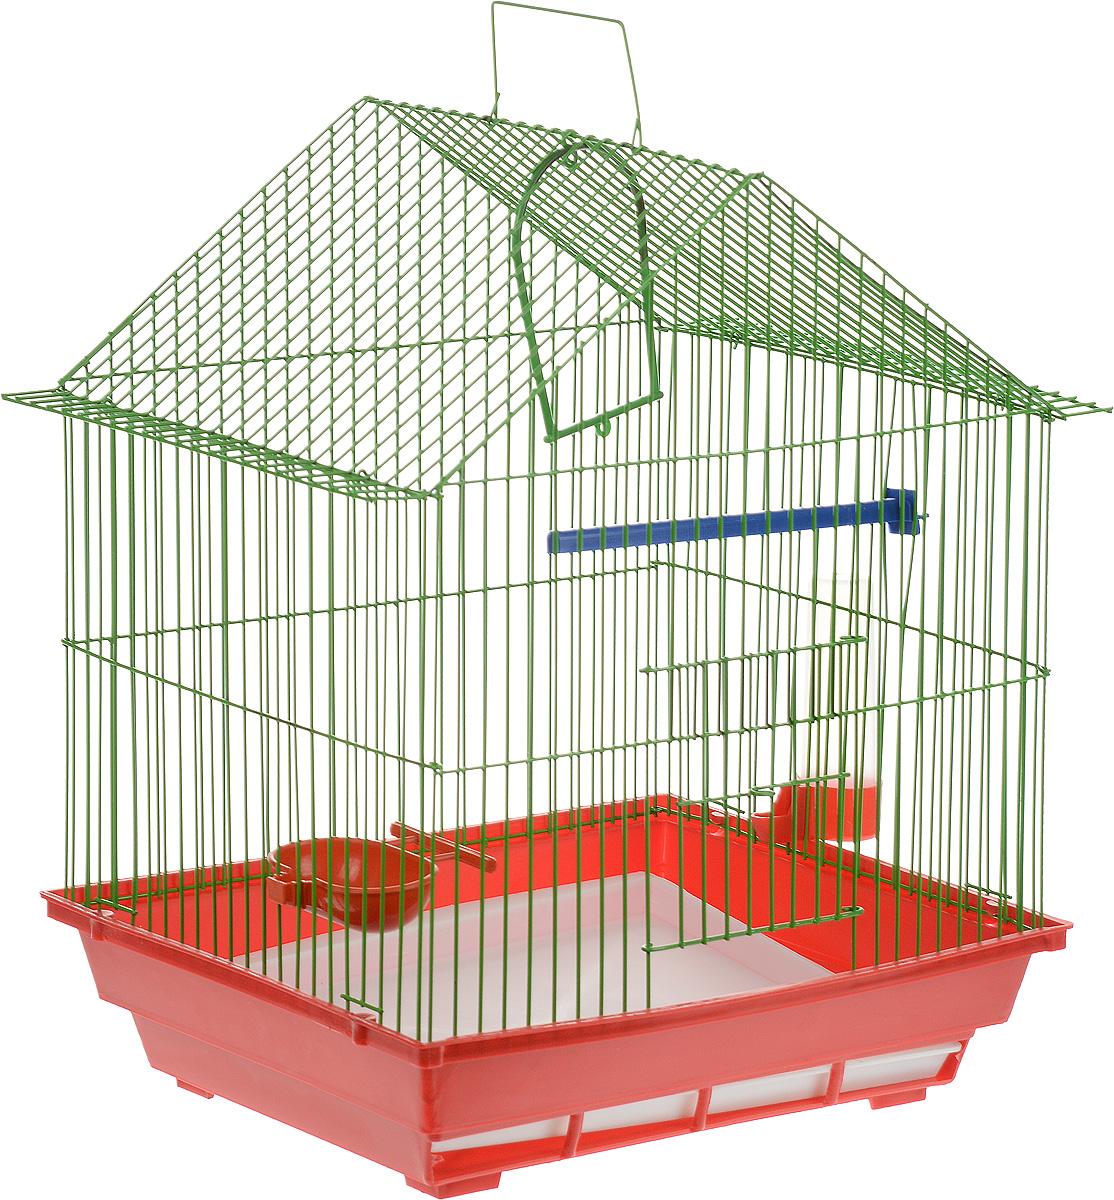 Клетка для птиц ЗооМарк, цвет: красный поддон, зеленая решетка, 39 х 28 х 42 см цена